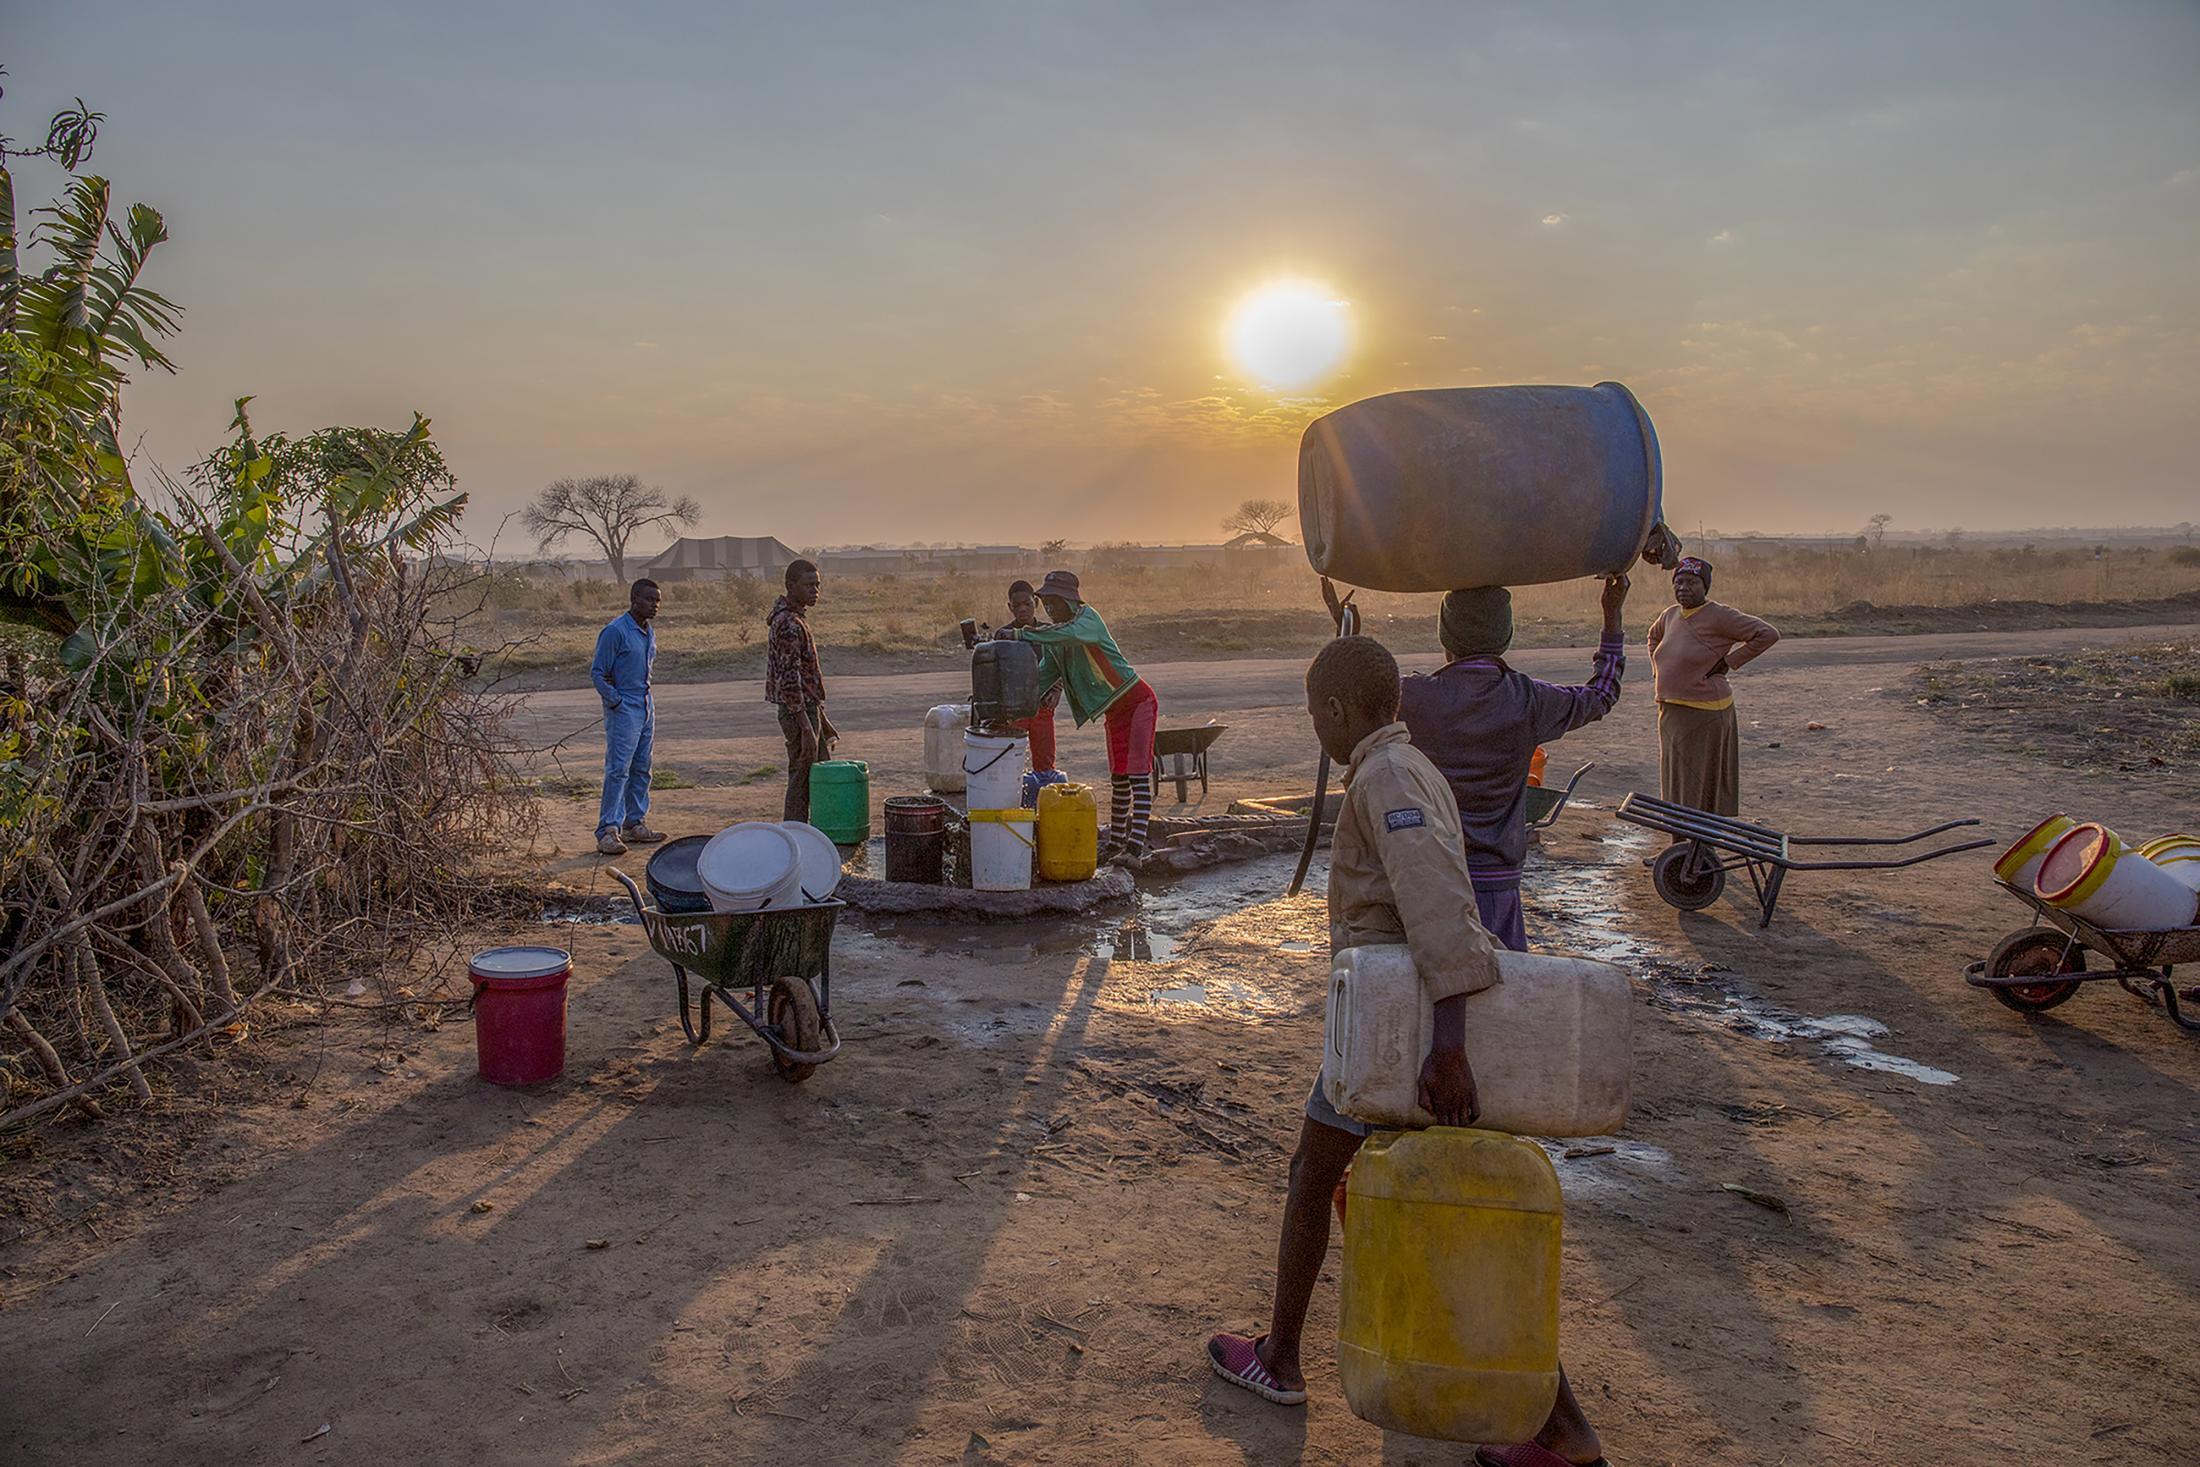 Residents of Empopini queue up for water in the southwestern city of Bulawayo, Zimbabwe. Cynthia Matonhodze for Bloomberg.